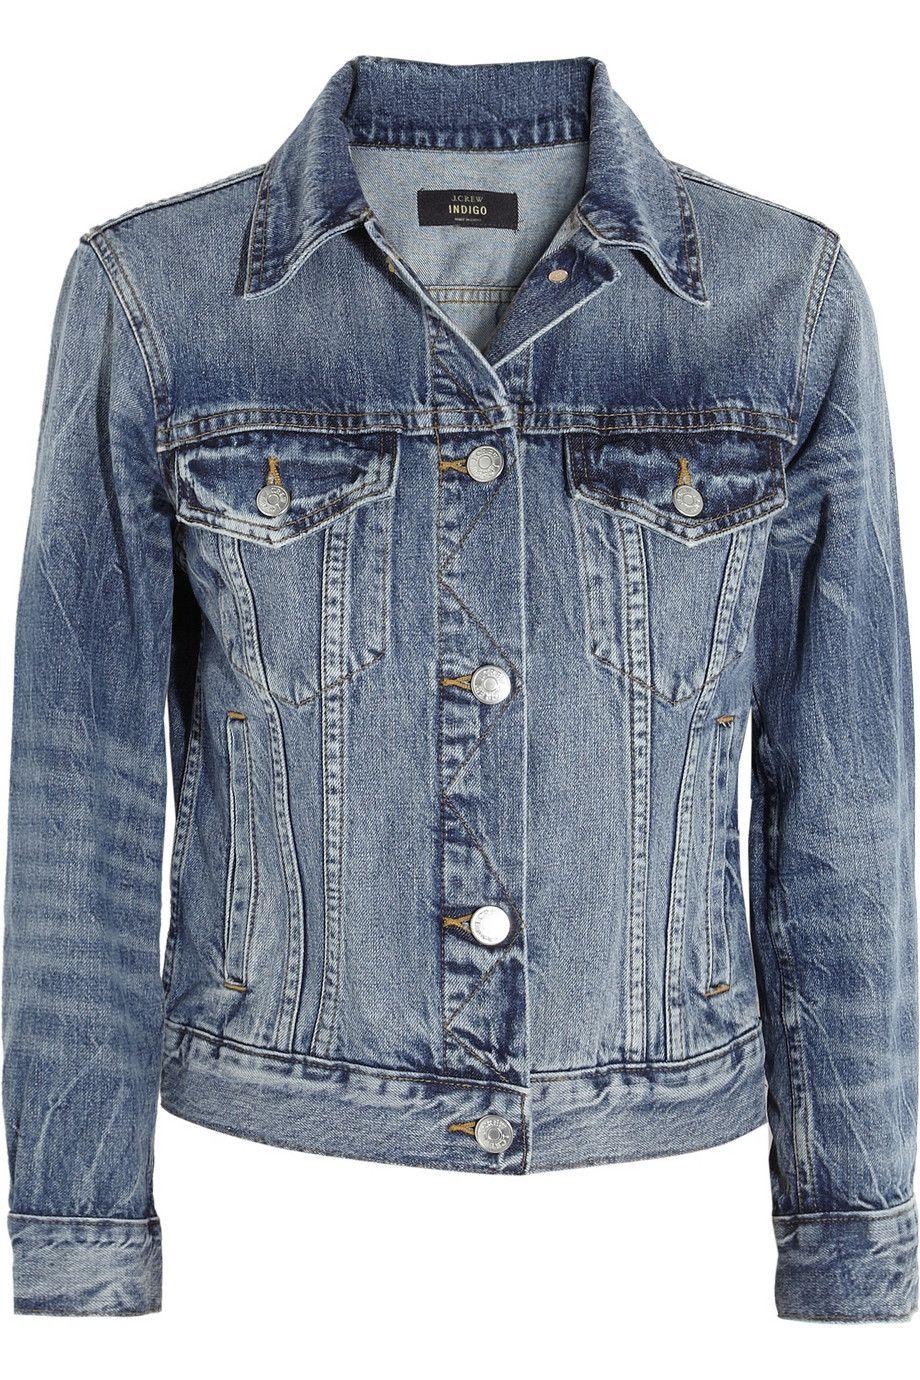 Mid Denim Vintage Denim Jacket J Crew Vintage Denim Jacket Vintage Denim Vintage Jean Jacket